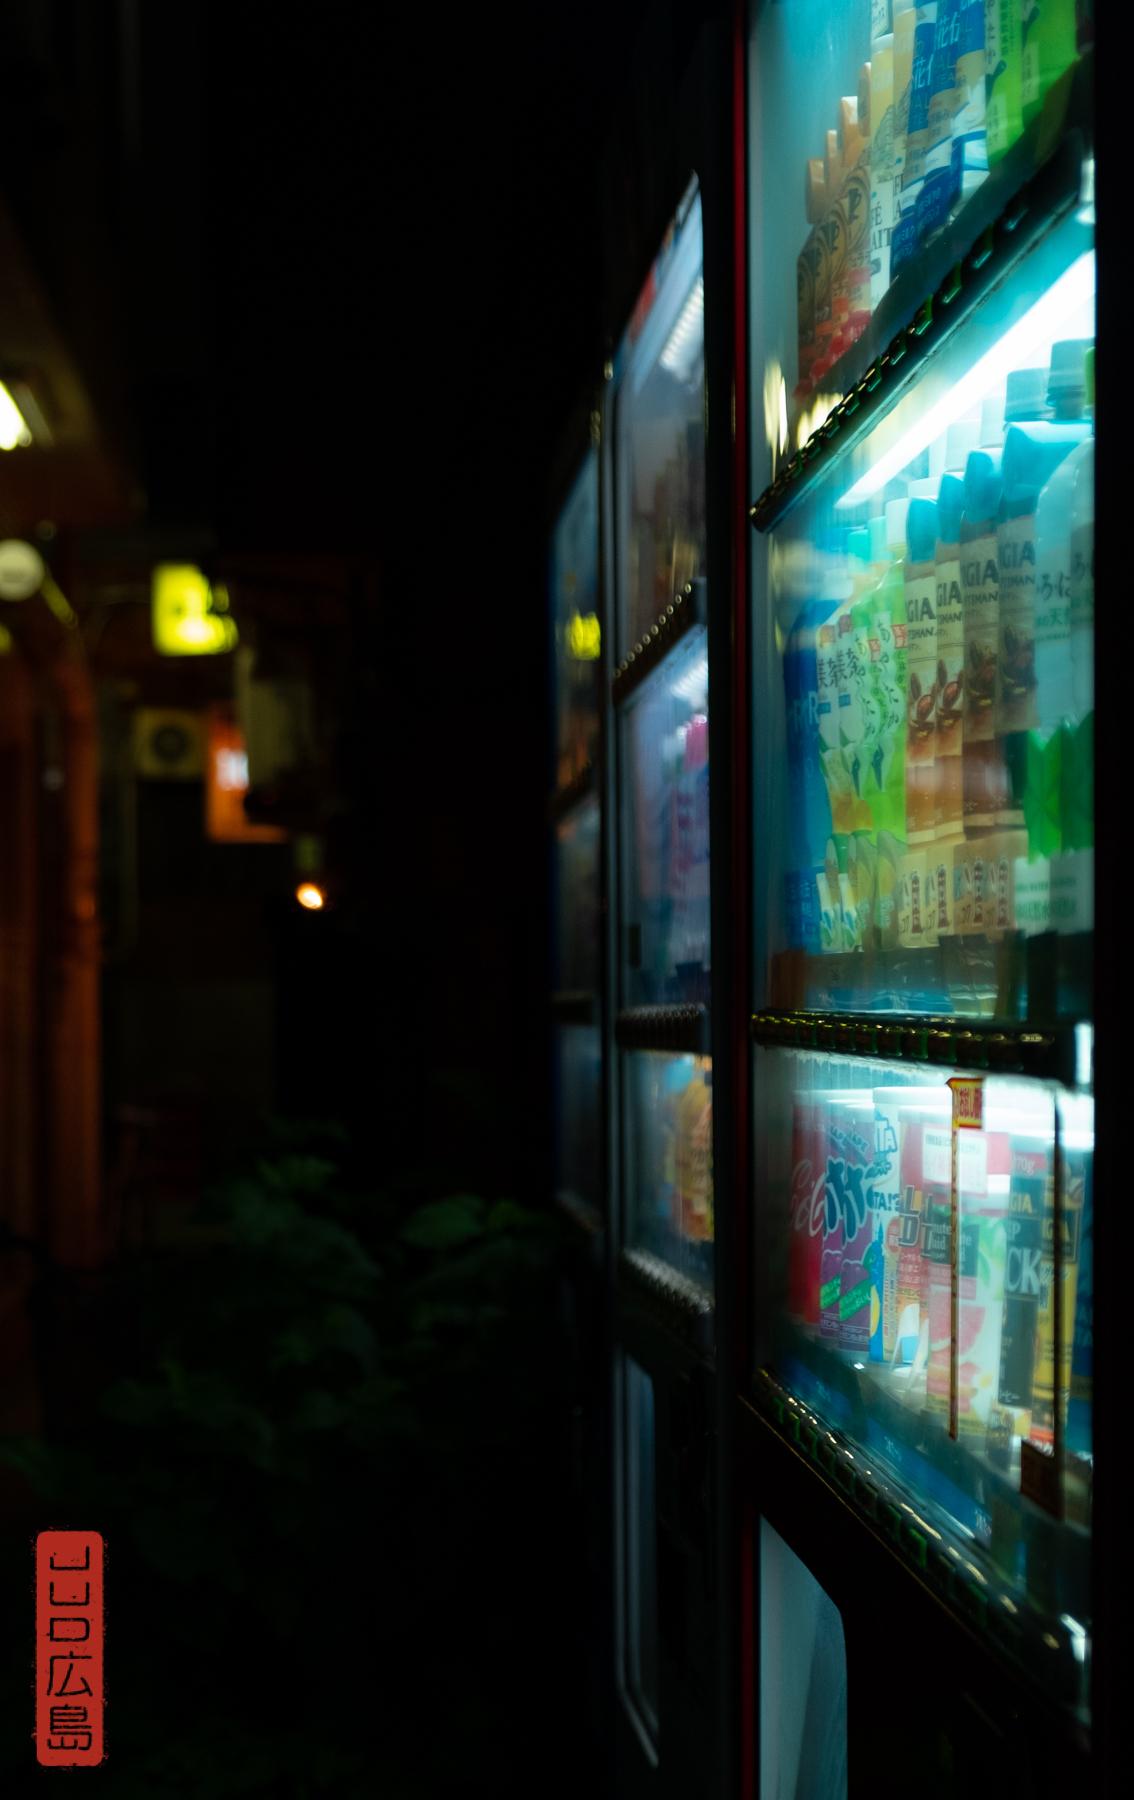 Hiroshima Nagarekawa / distributeurs de boisson